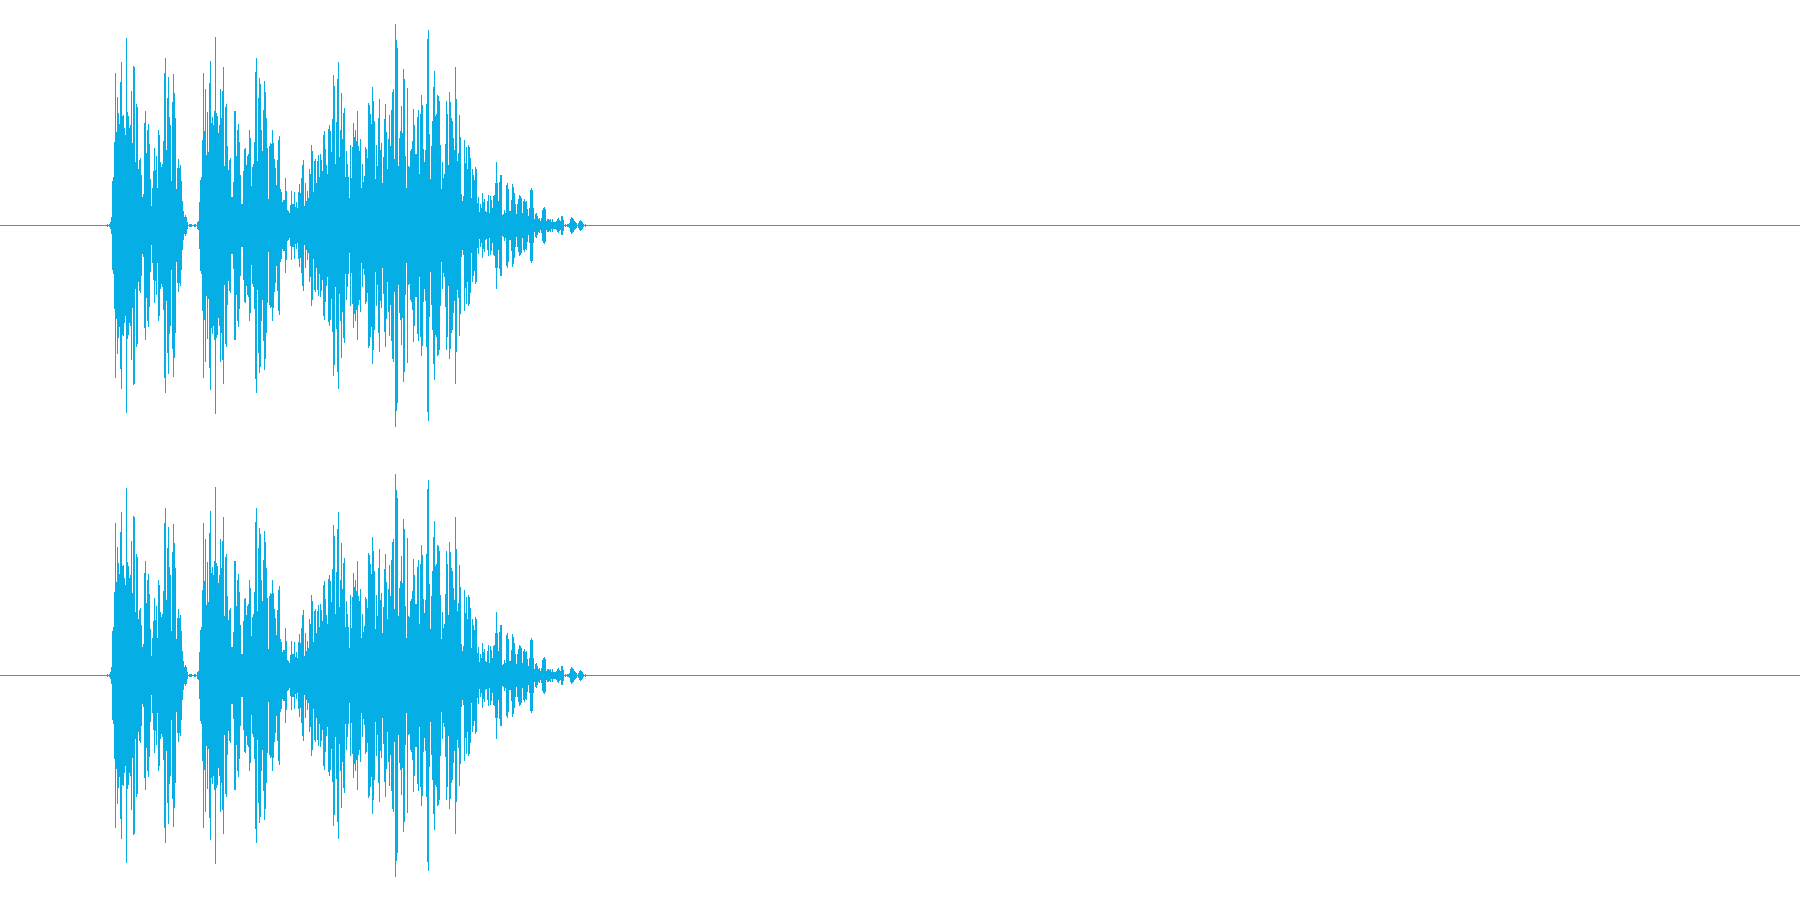 GEN-格闘01-06(ヒット)の再生済みの波形